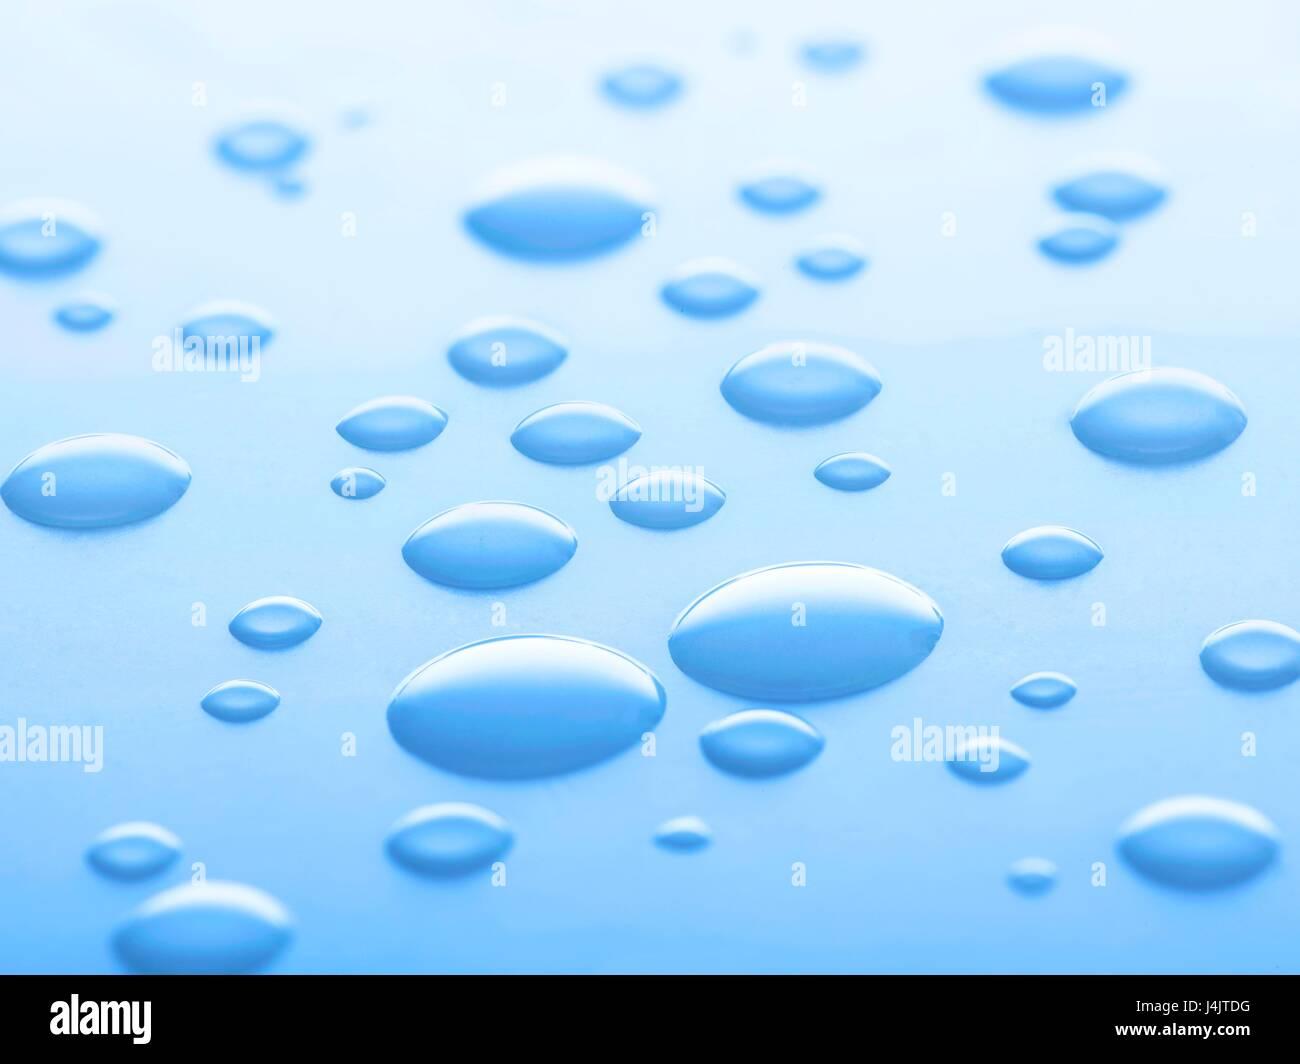 Las gotas de agua, Foto de estudio. Imagen De Stock